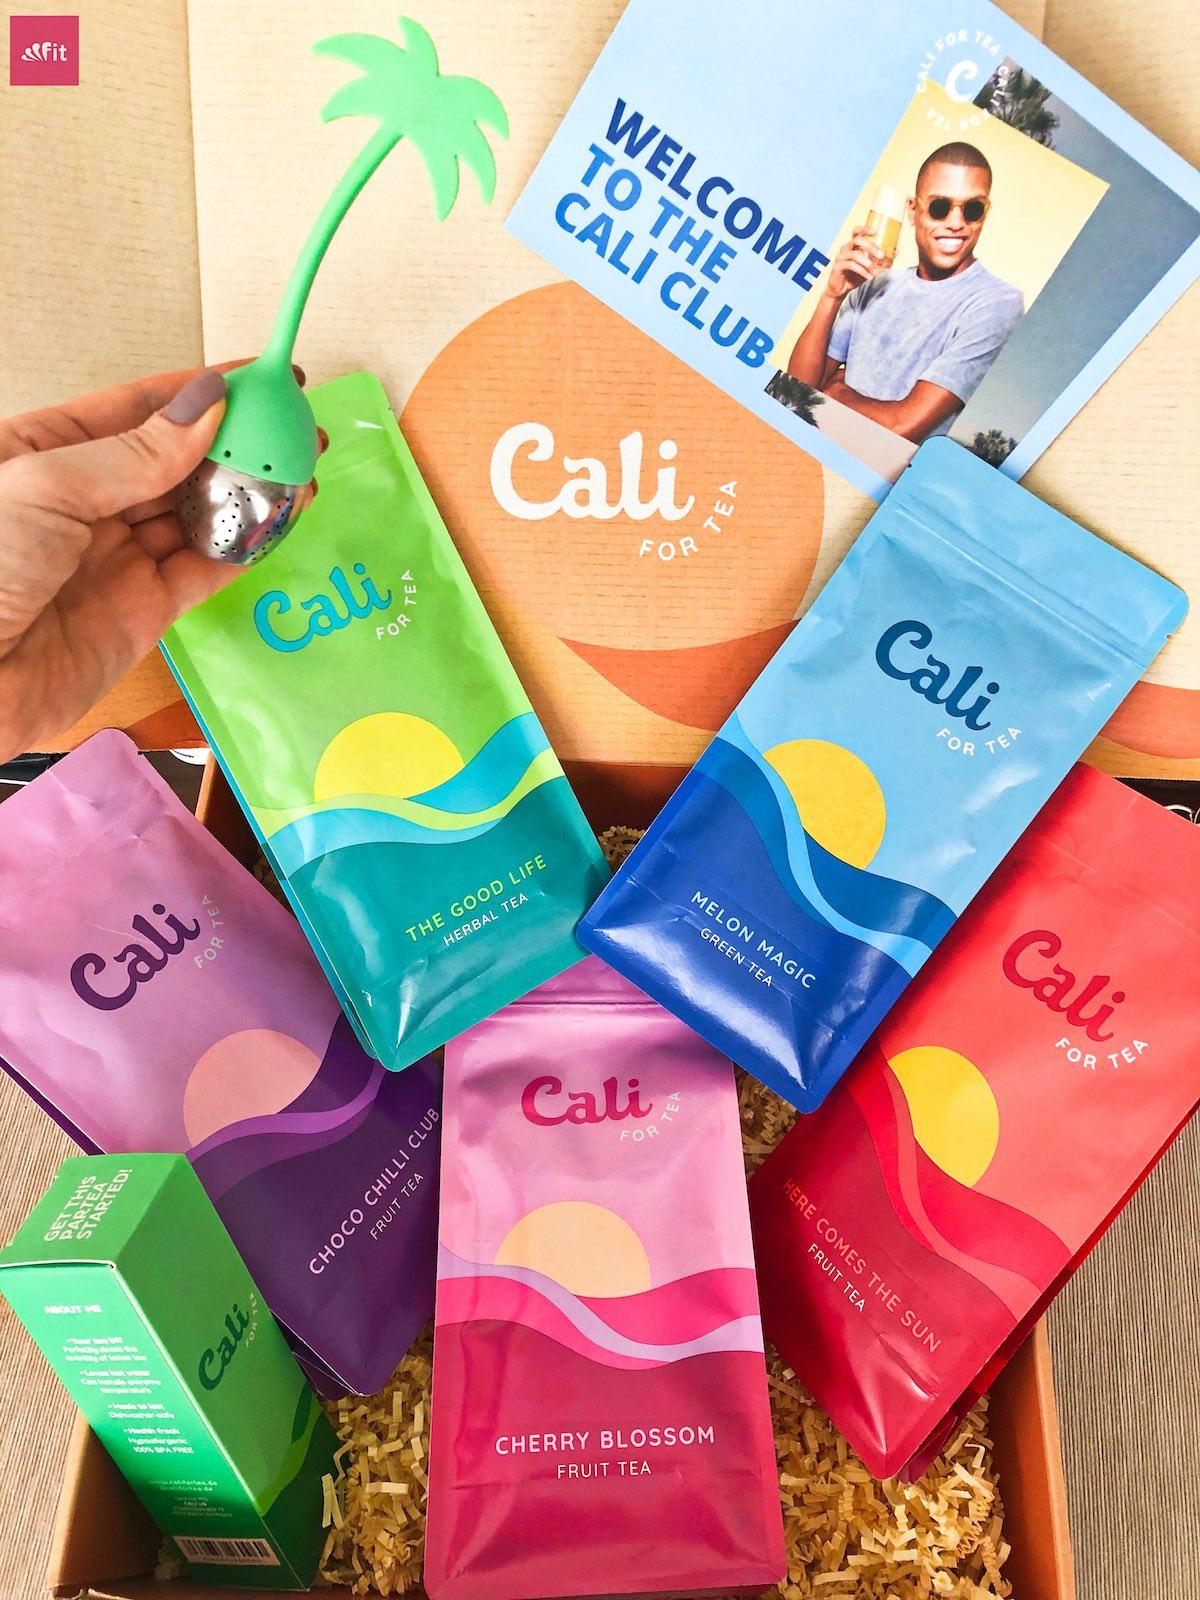 CaliforTea Erfahrungen Instagram Tee Cali for Tea Anwendung